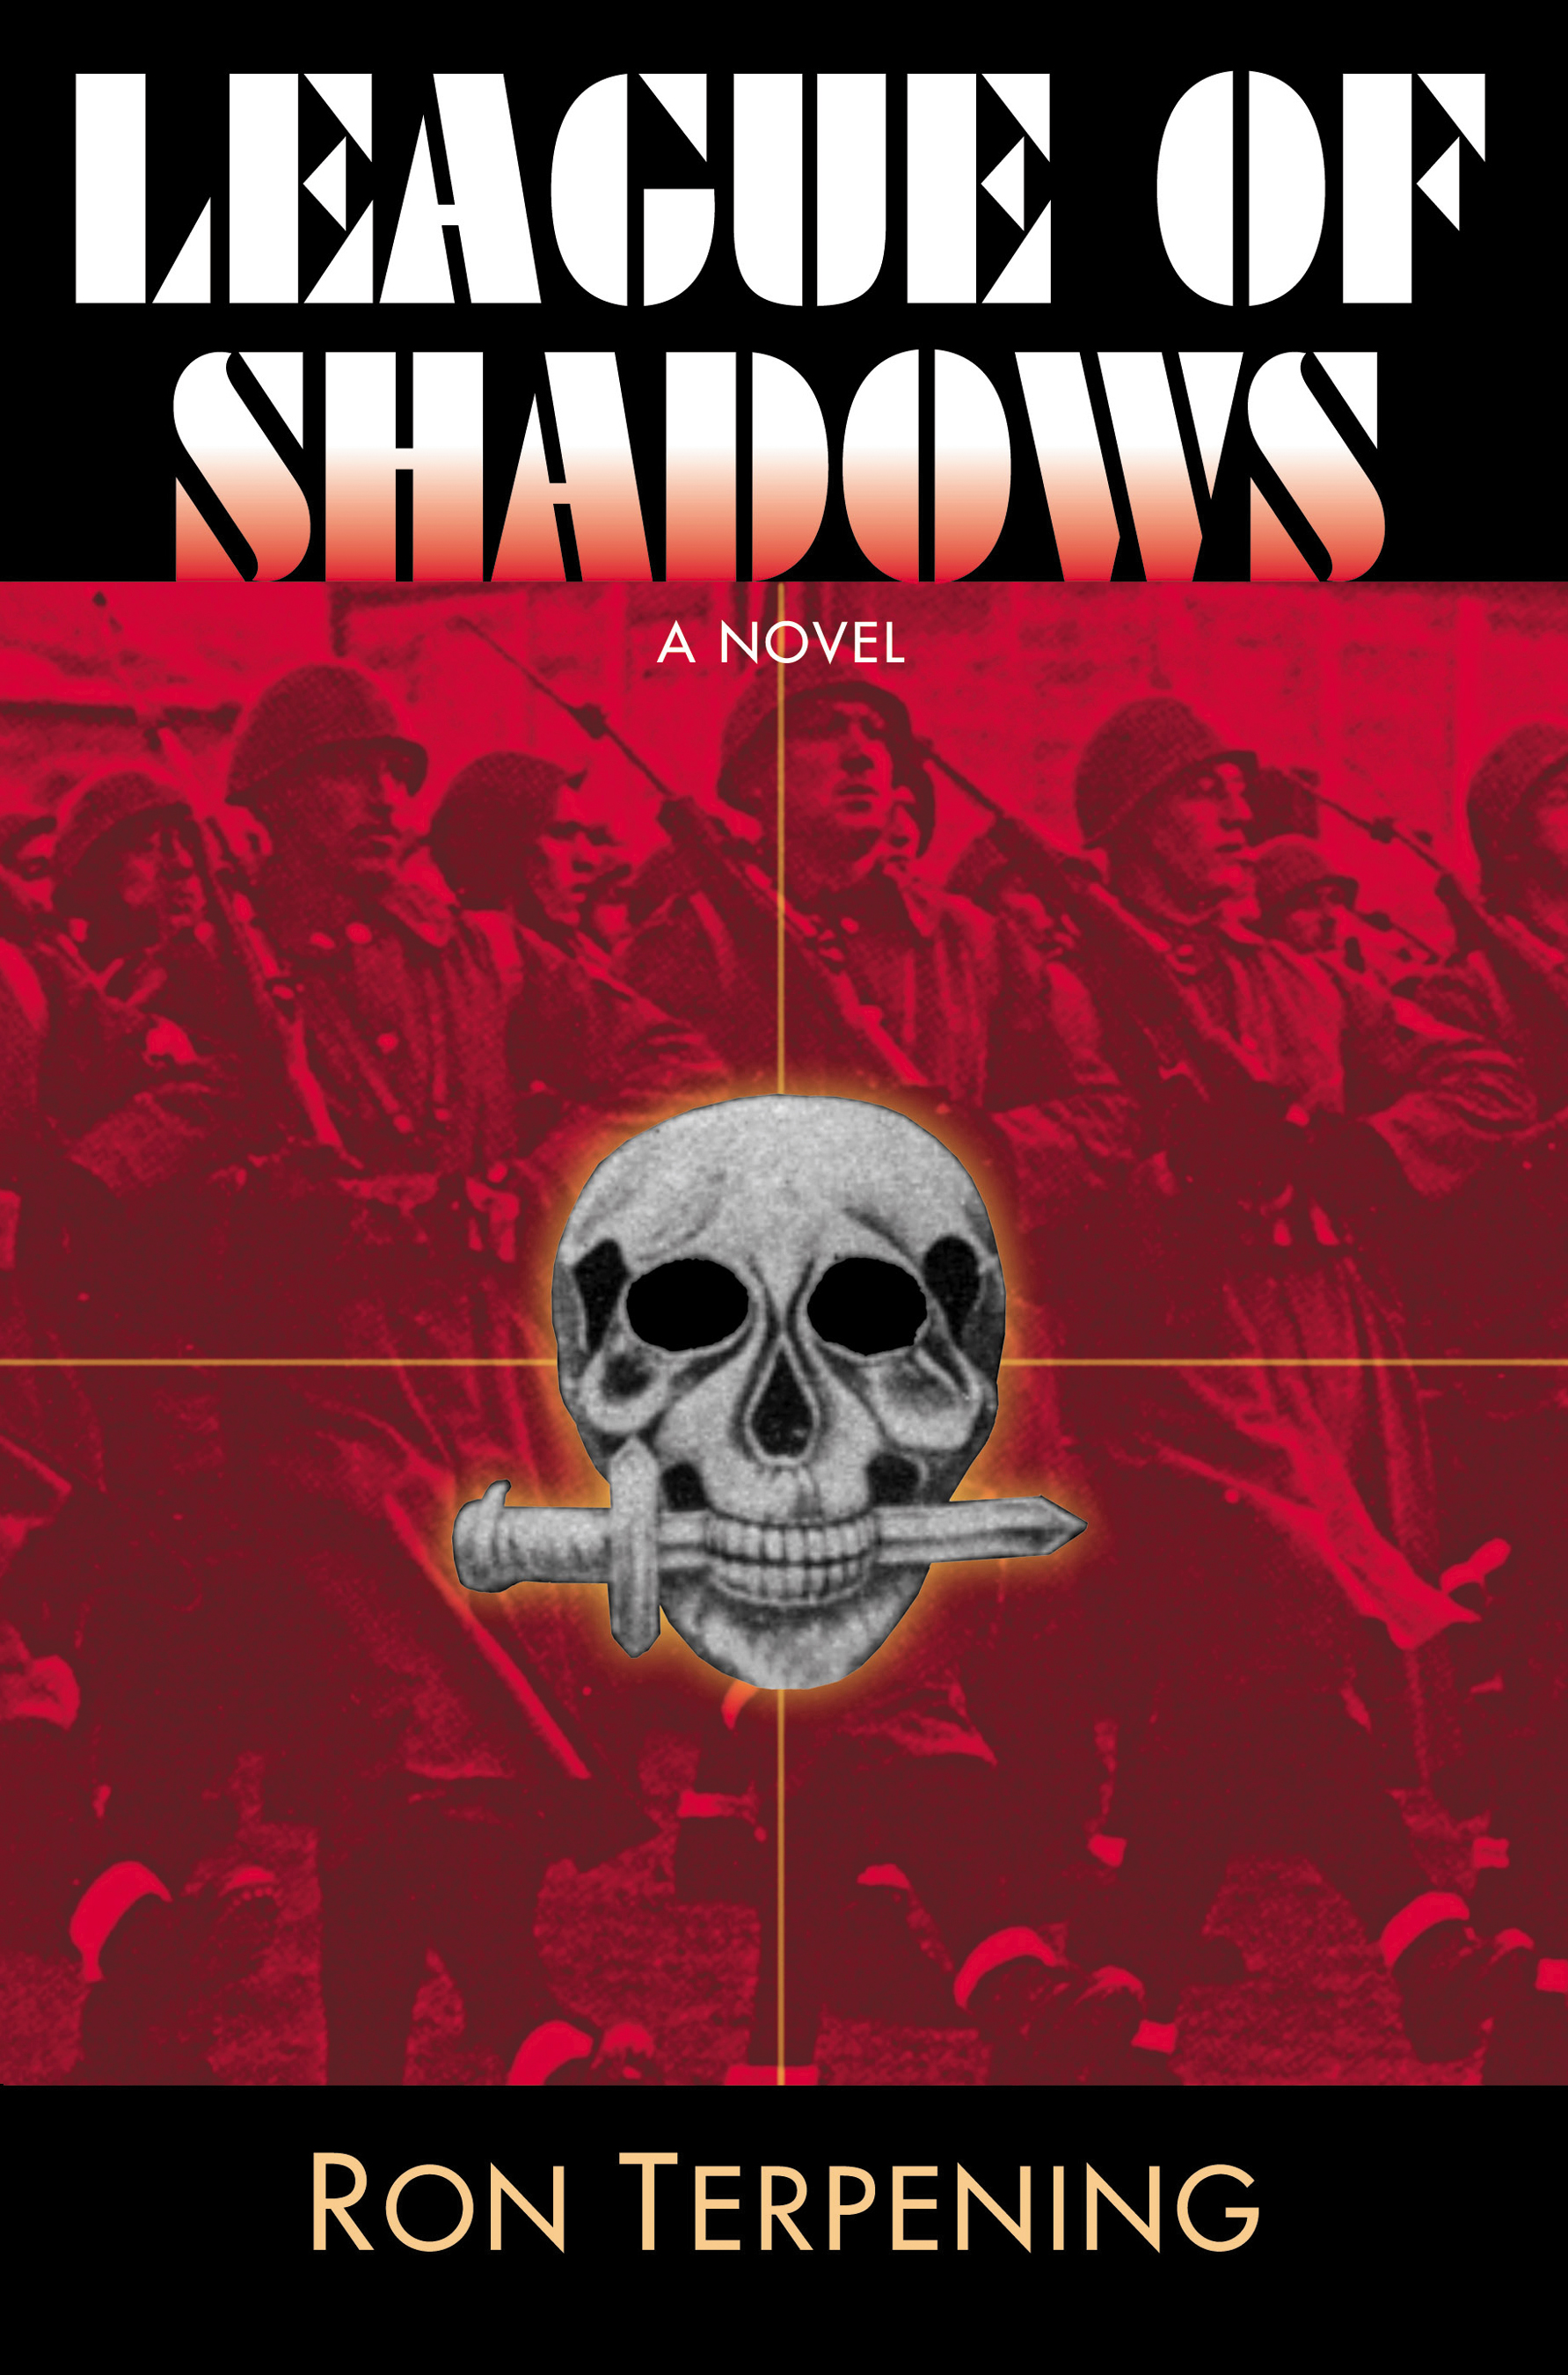 Fileleague of shadowsg wikimedia commons fileleague of shadowsg buycottarizona